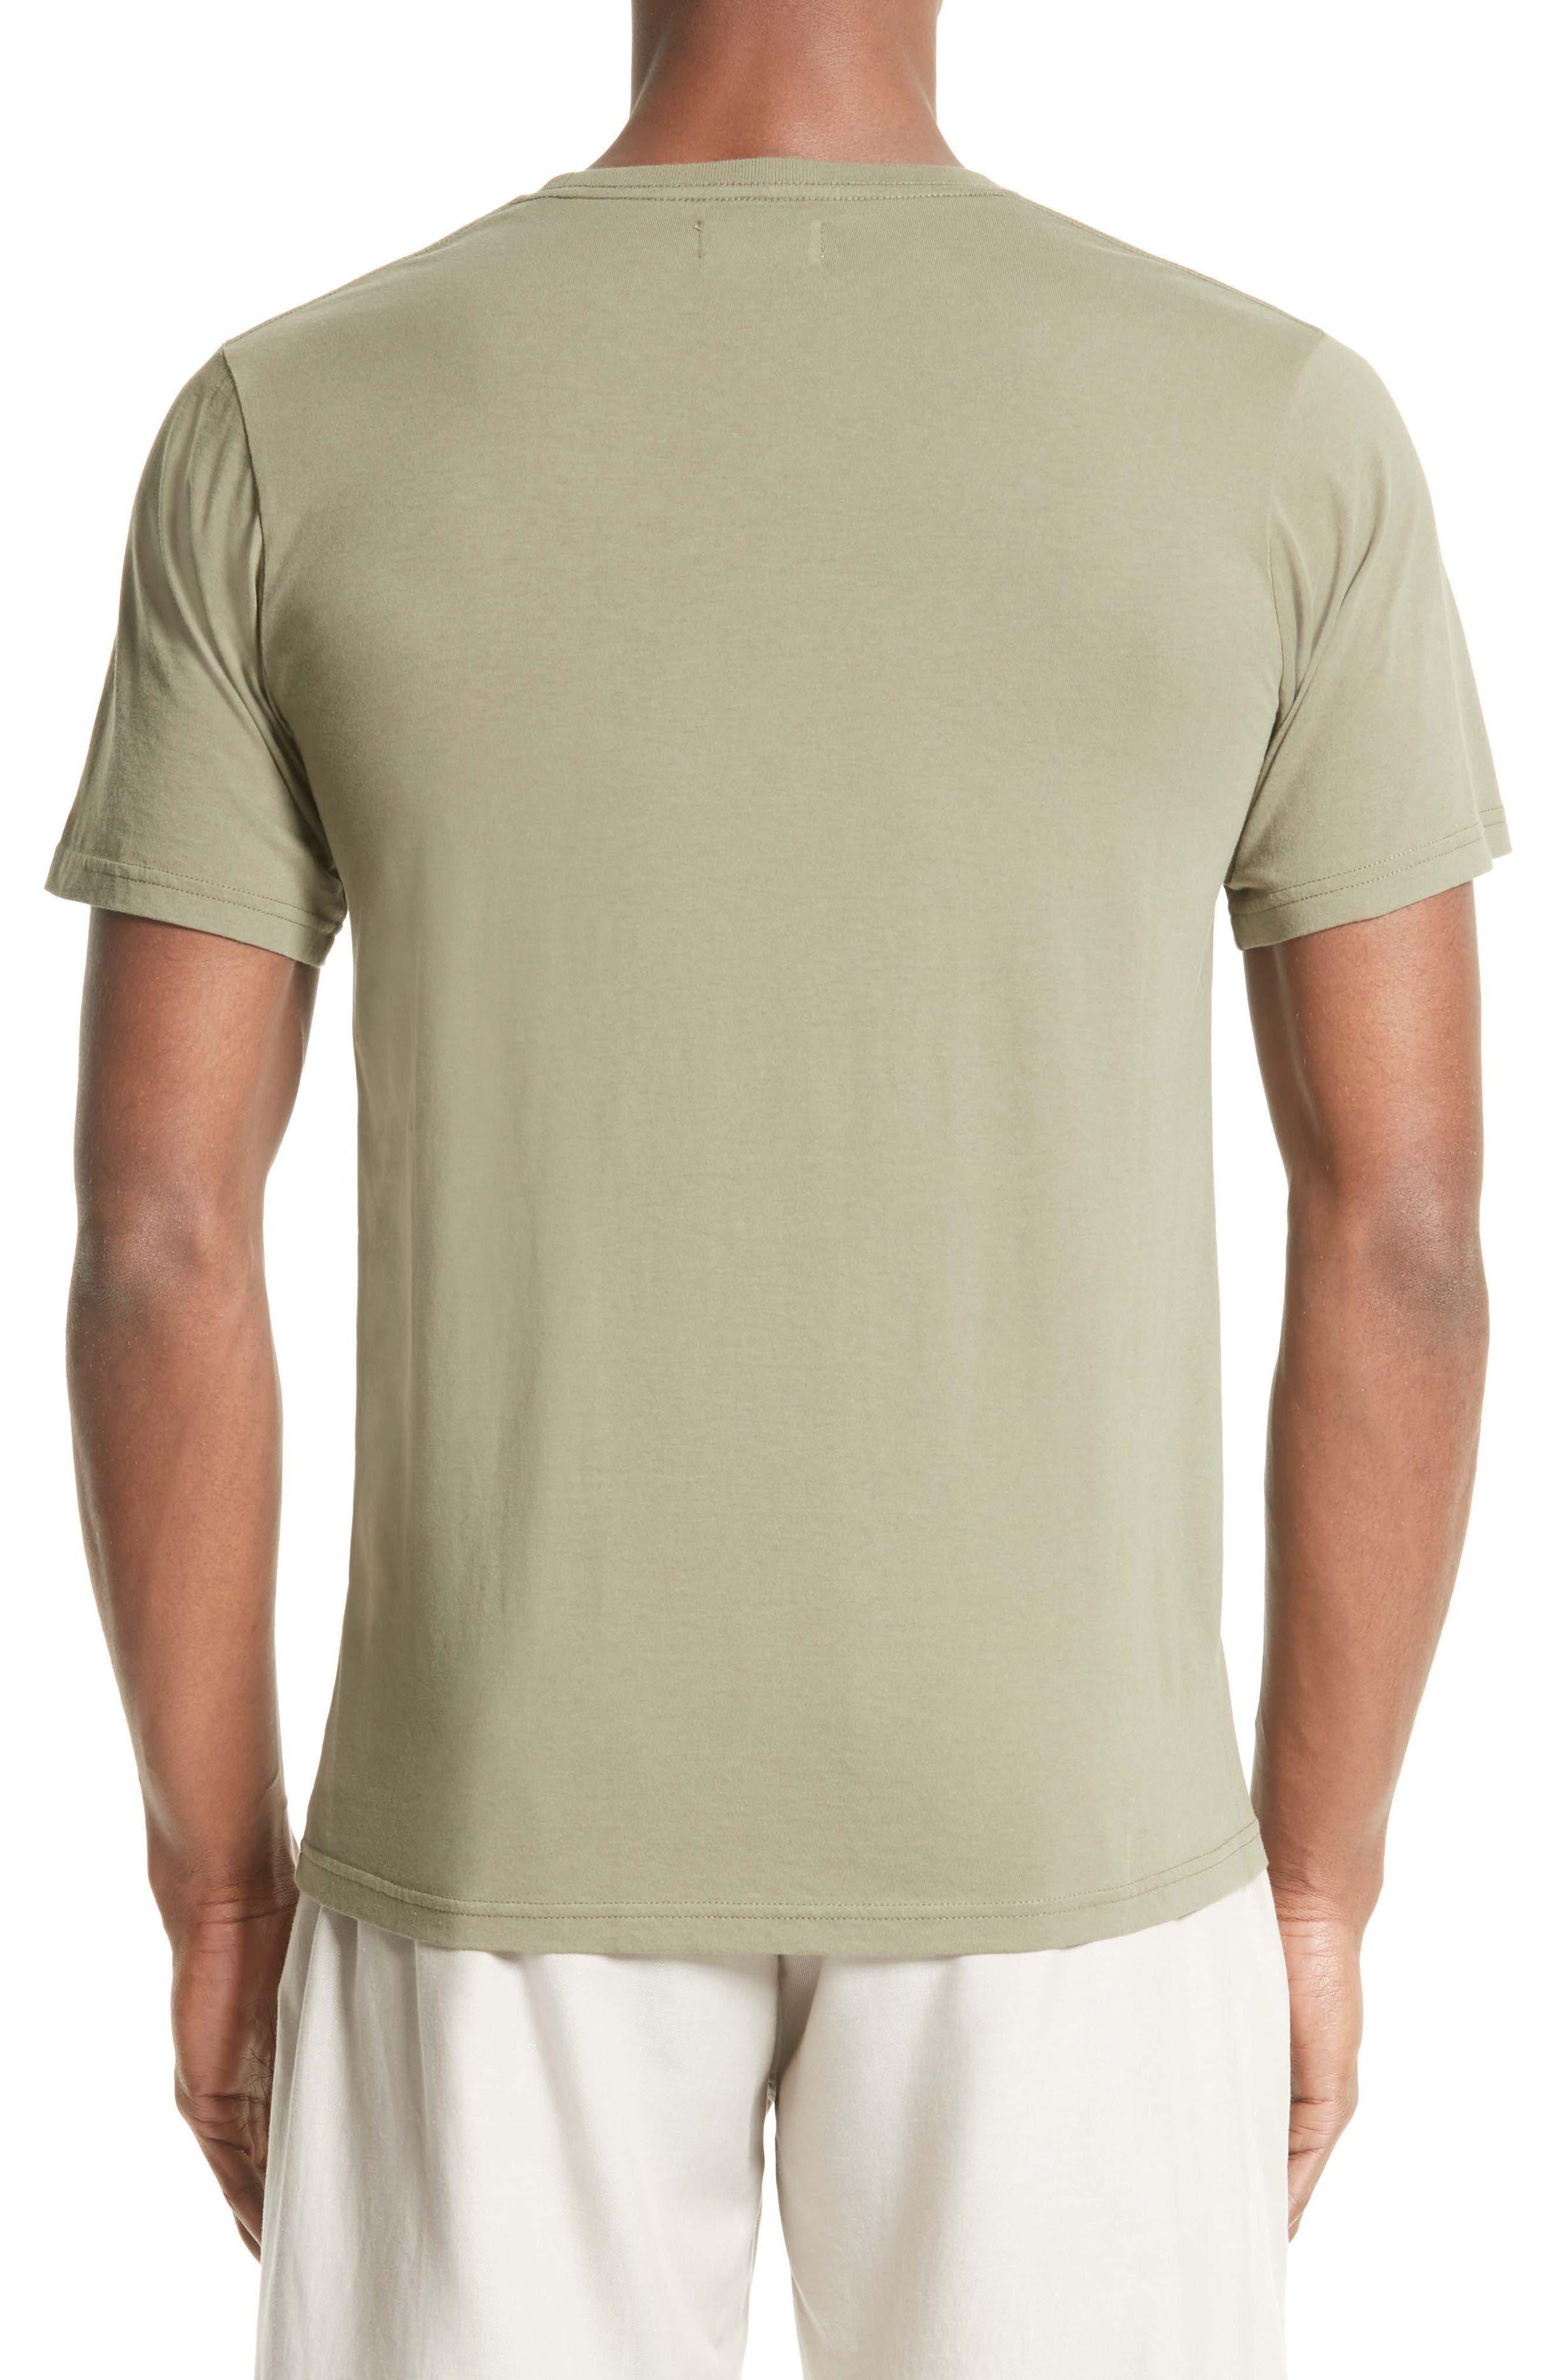 Miller T-Shirt,                             Alternate thumbnail 2, color,                             Sage